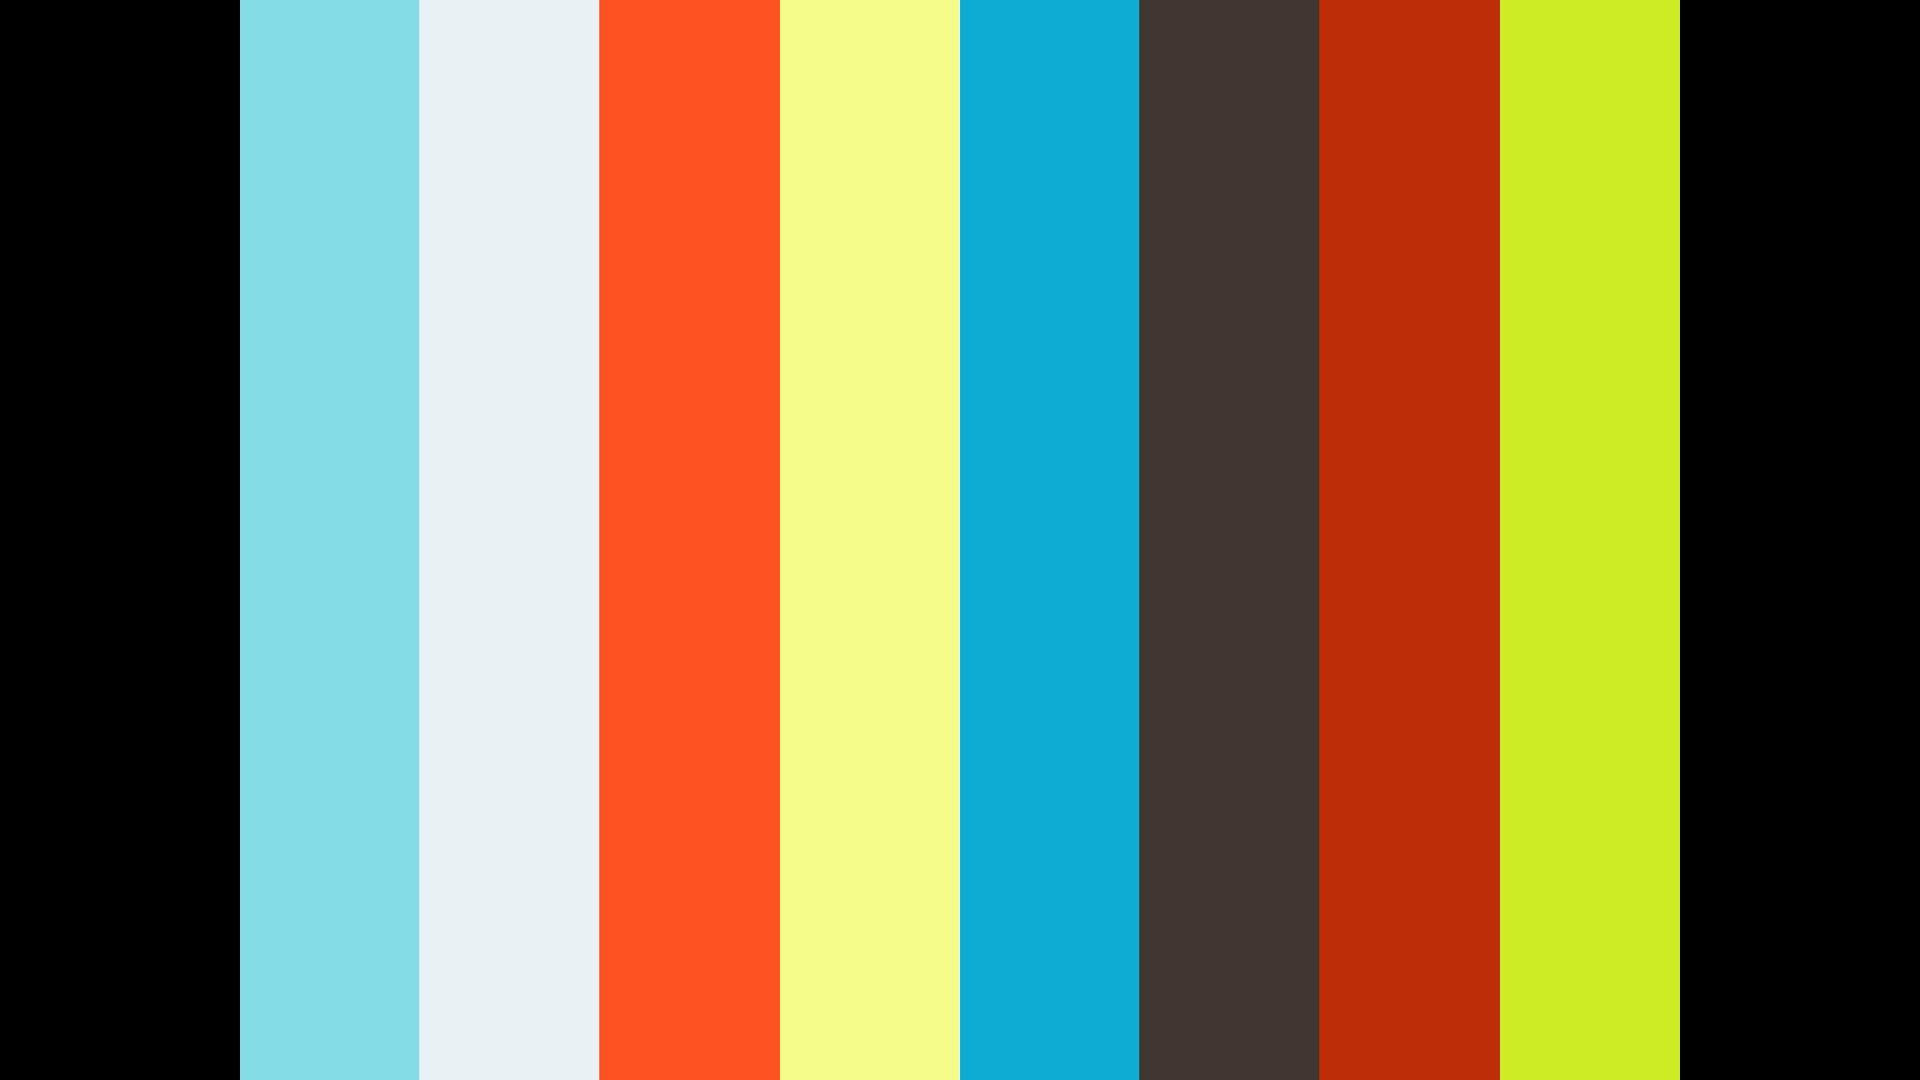 WEBSITE Roger Waters SPEAKEASY  5 Min Clip.mov